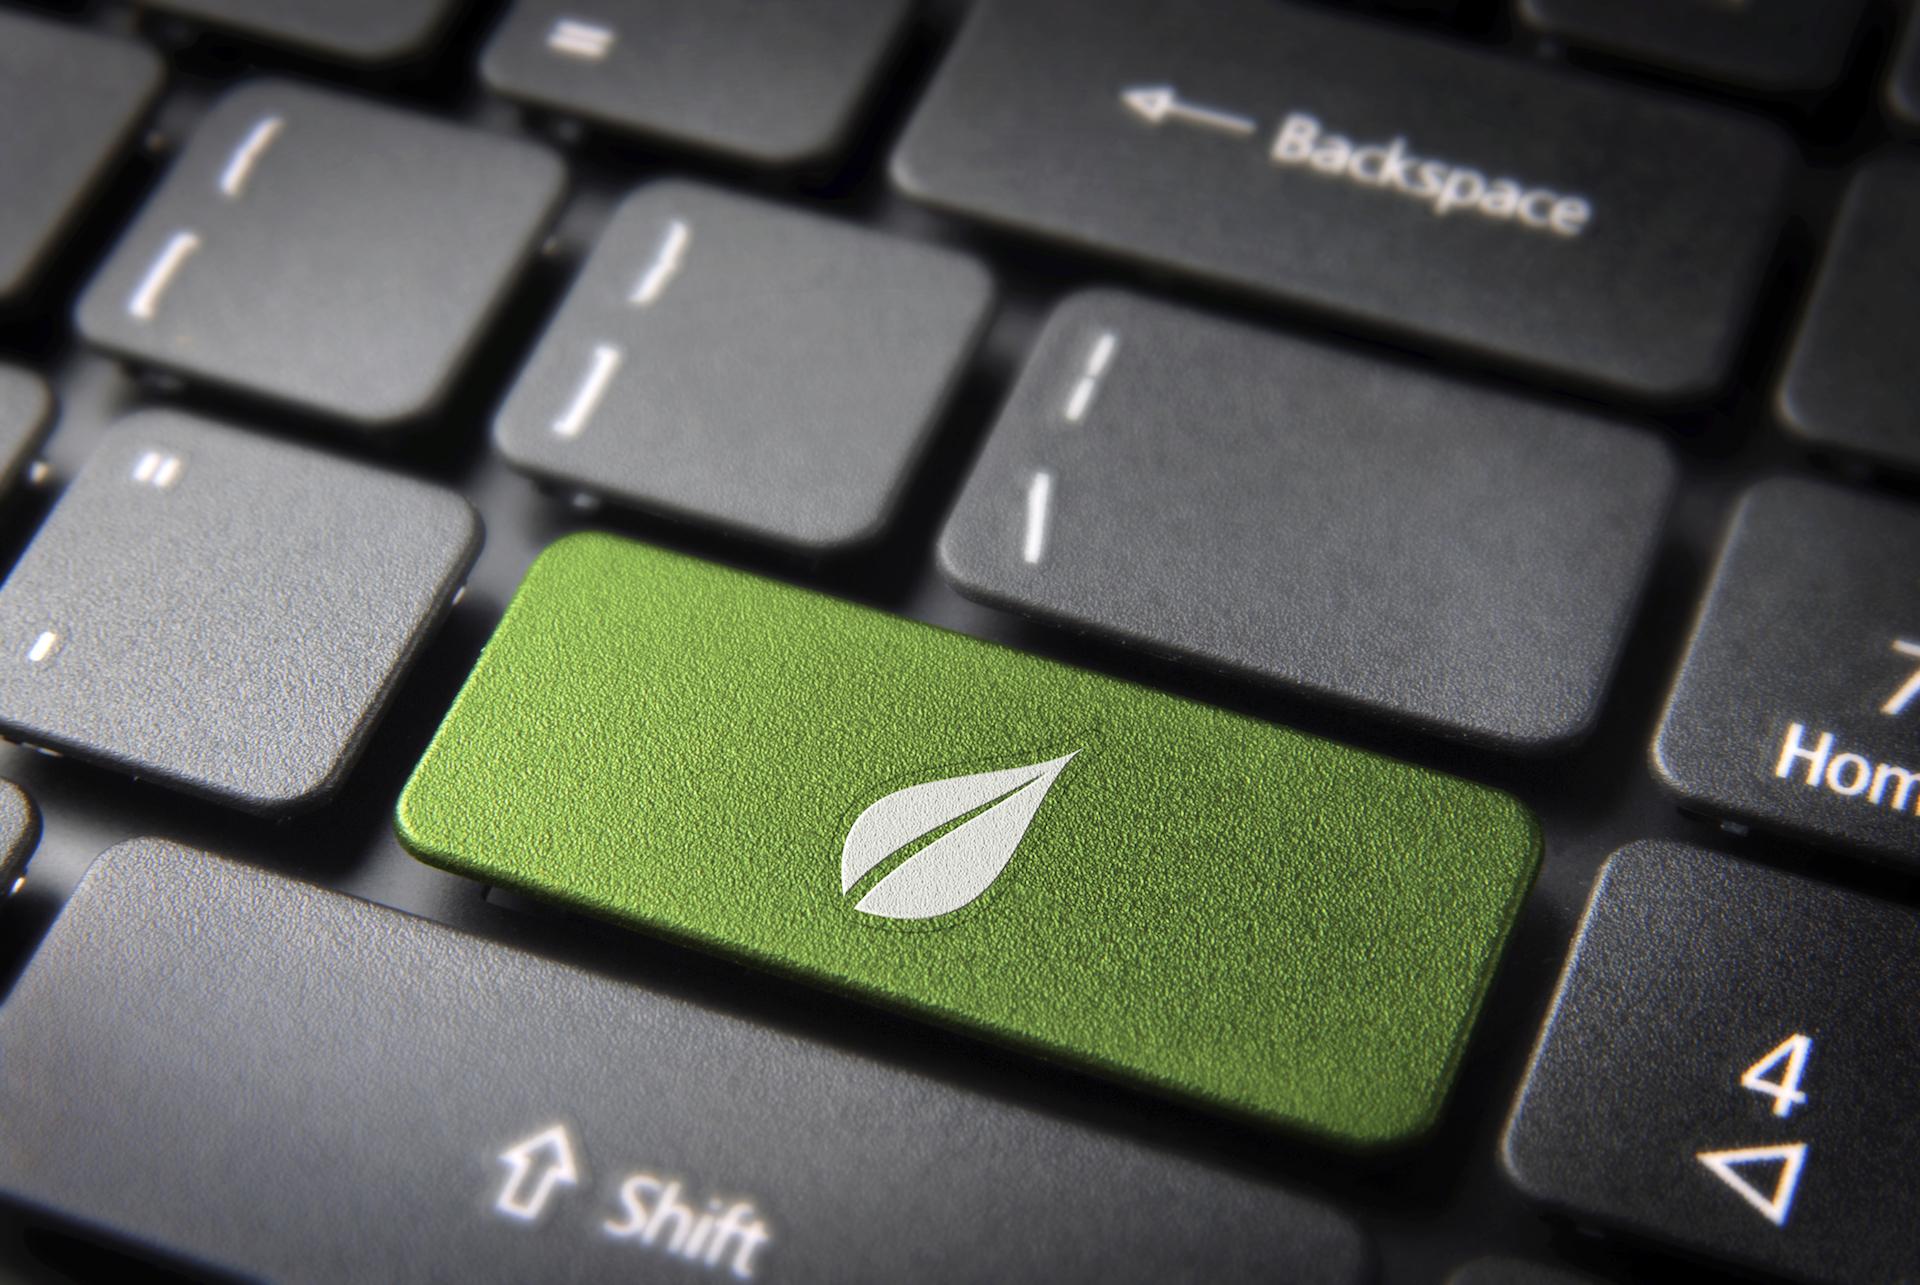 Green digital signage